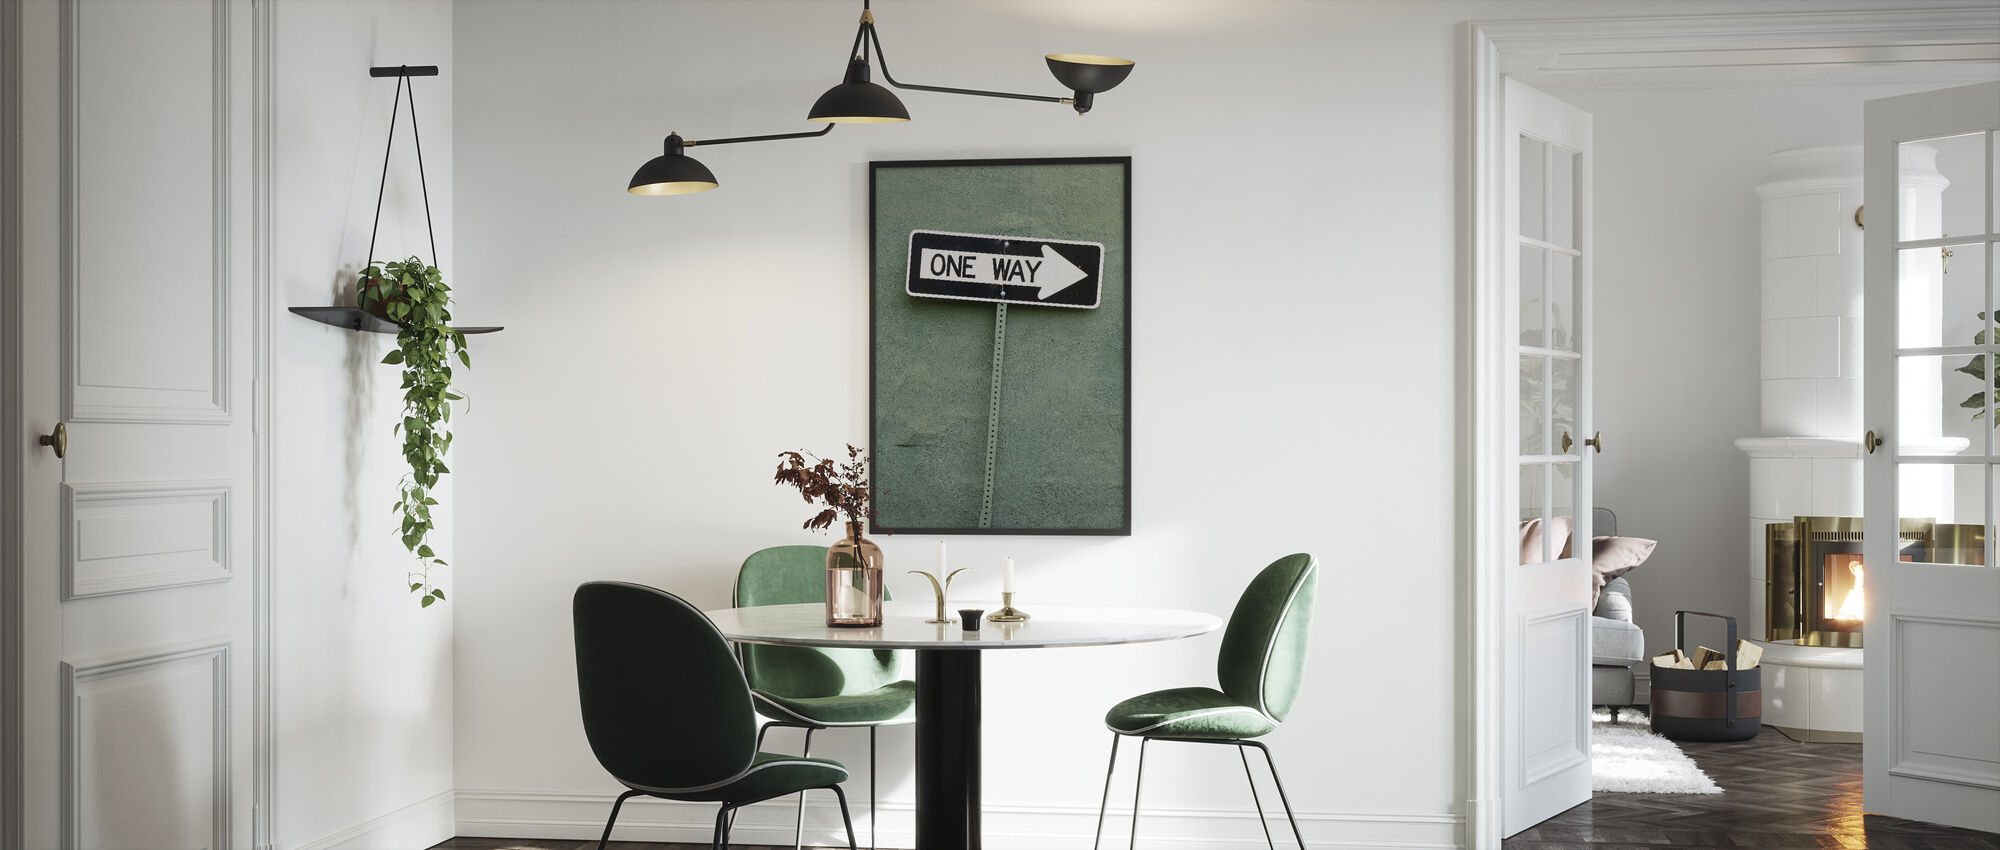 One Way - Framed print - Kitchen